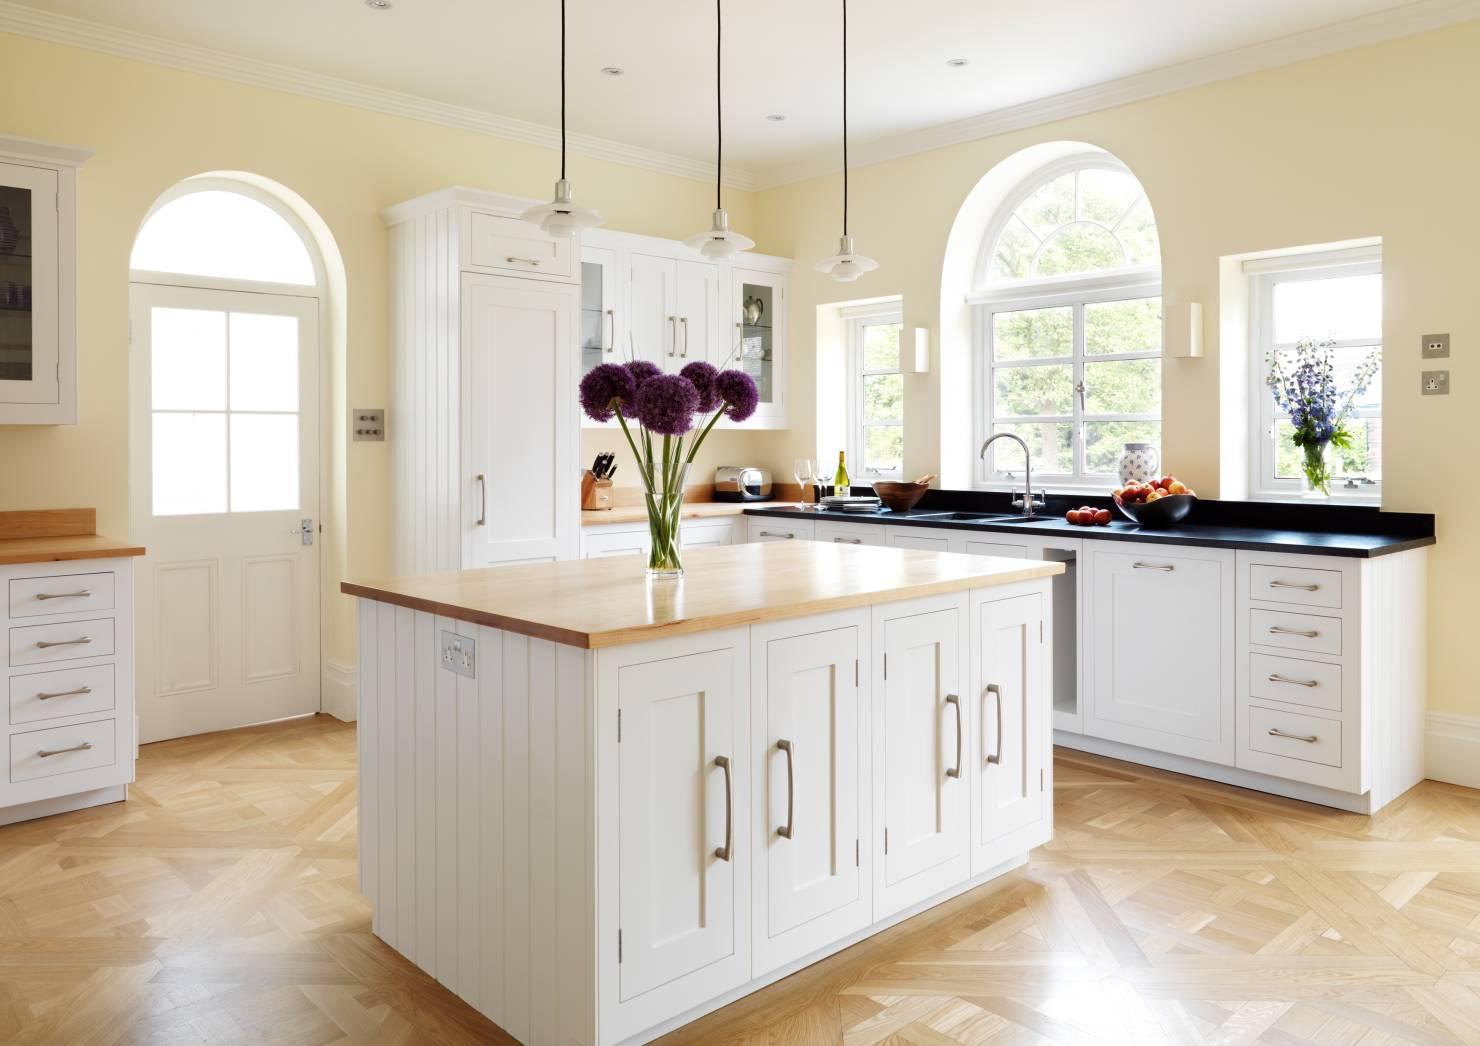 Rustic Kitchen Cabinets - Awsome White Rustic Kitchen